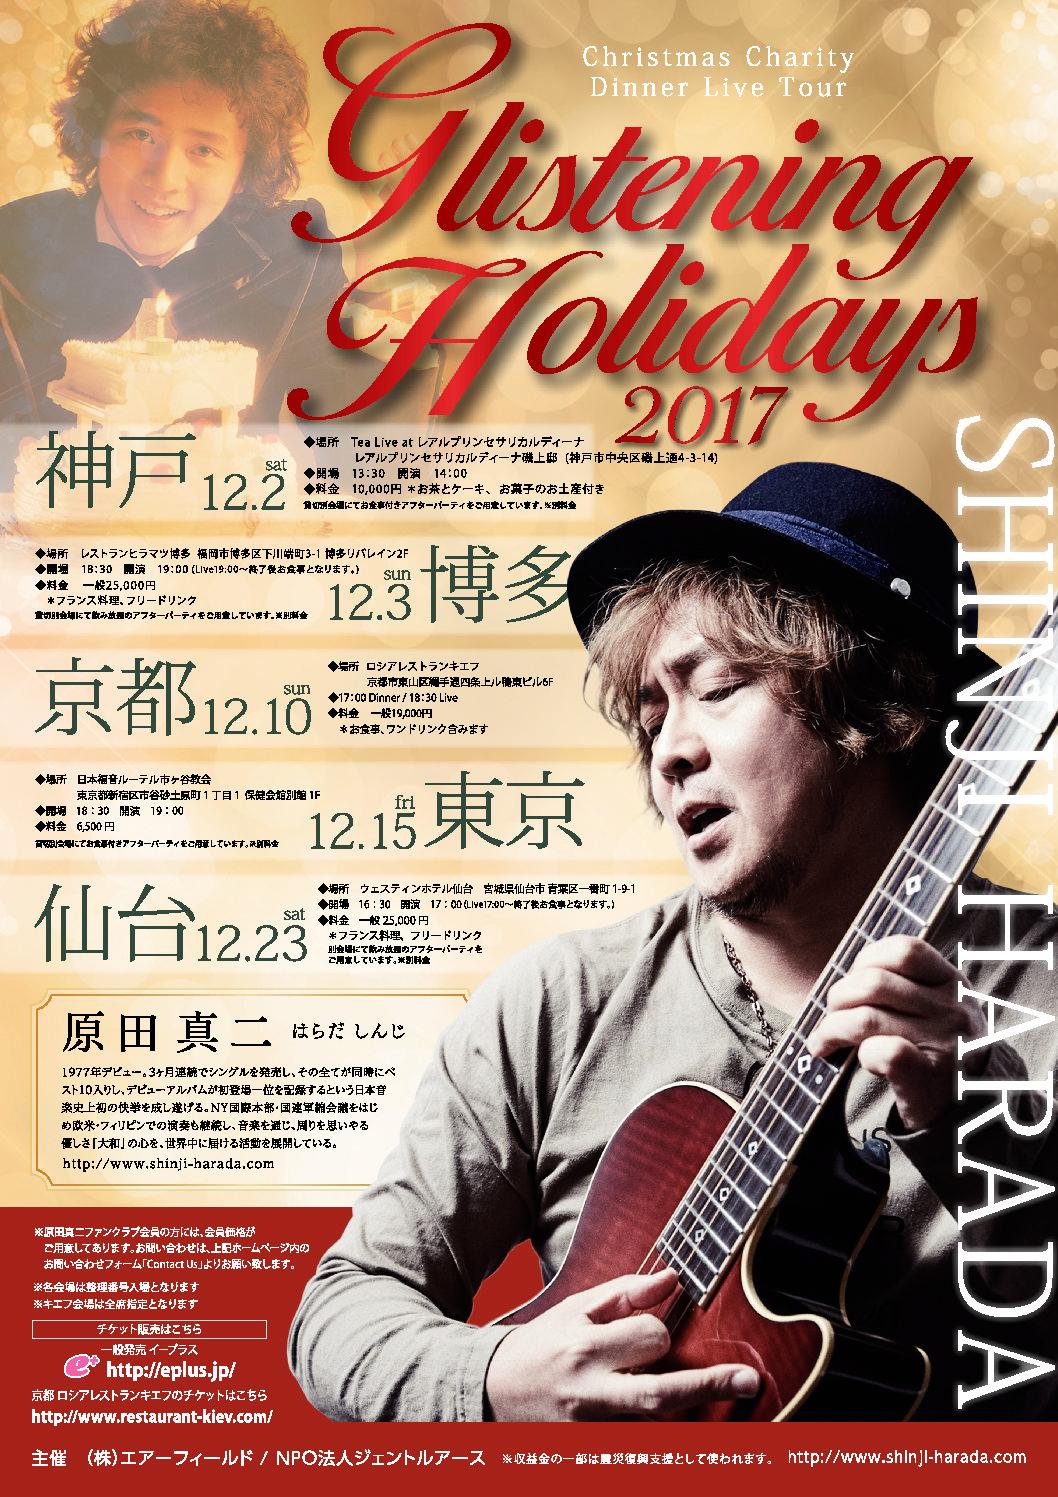 ★ Christmas Charity Dinner Live Tour Glistening Holidays 2017お申込み受付中!